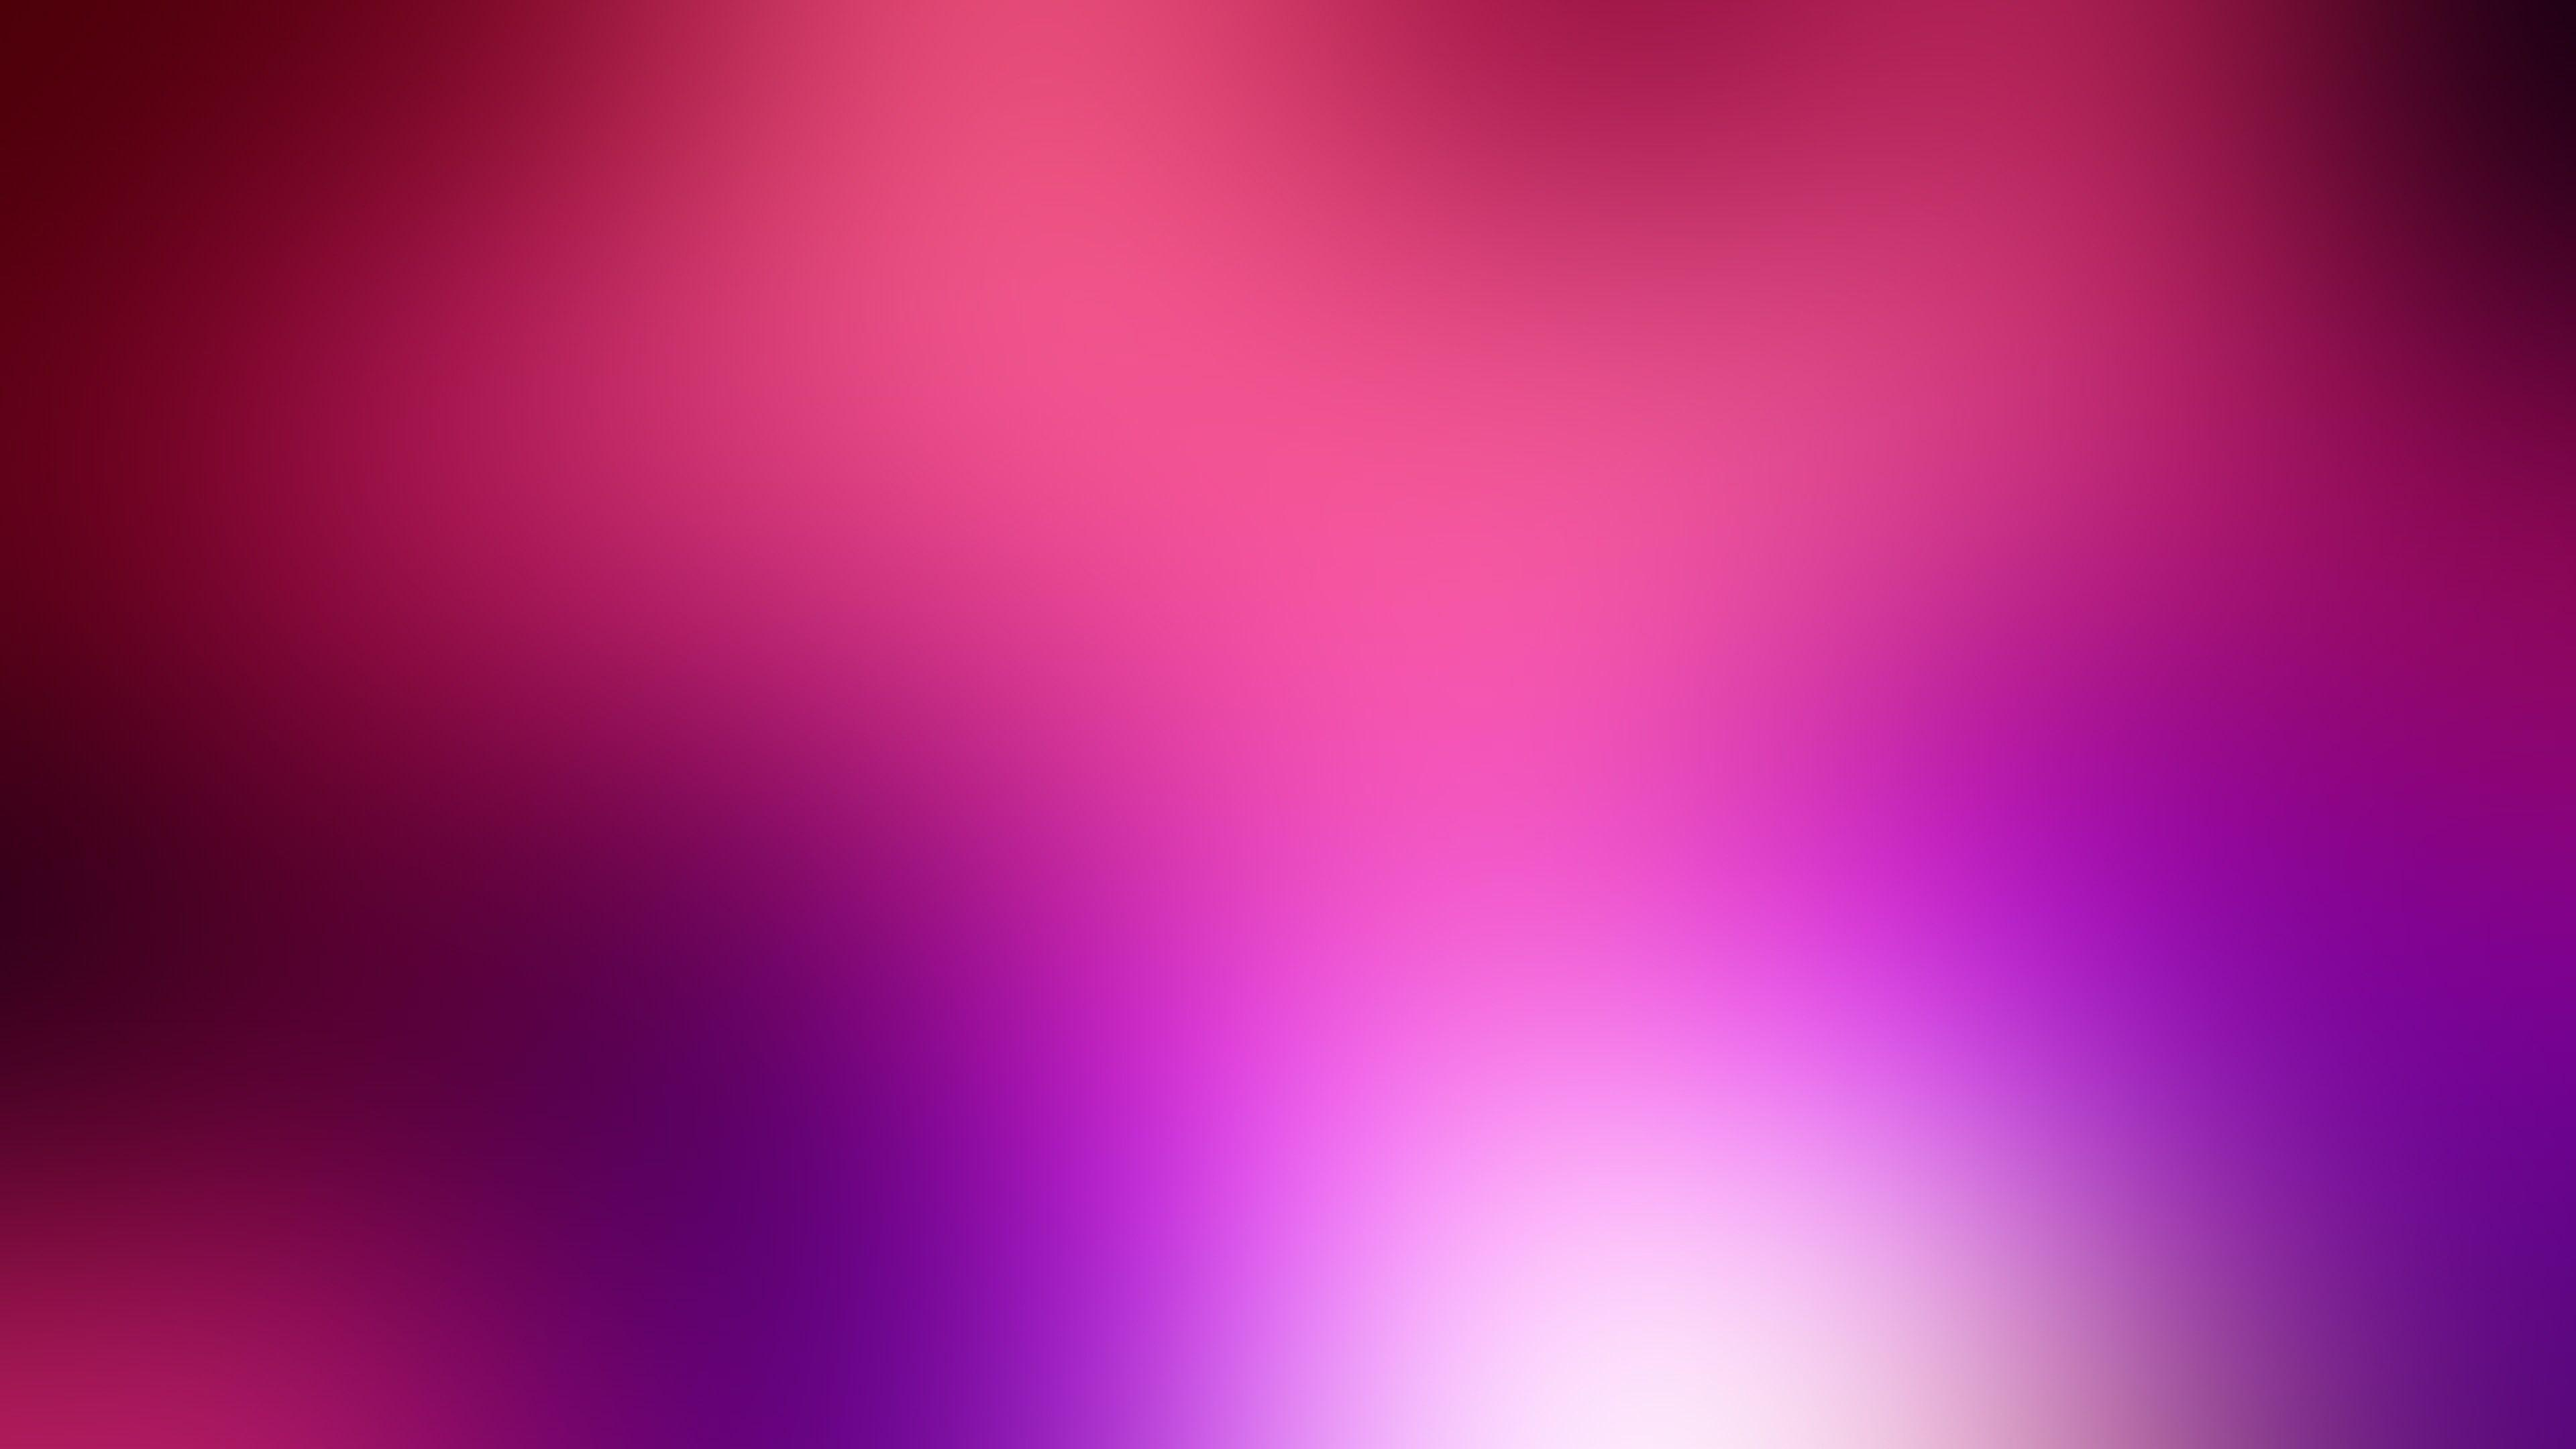 light purple wallpaper hd - photo #36